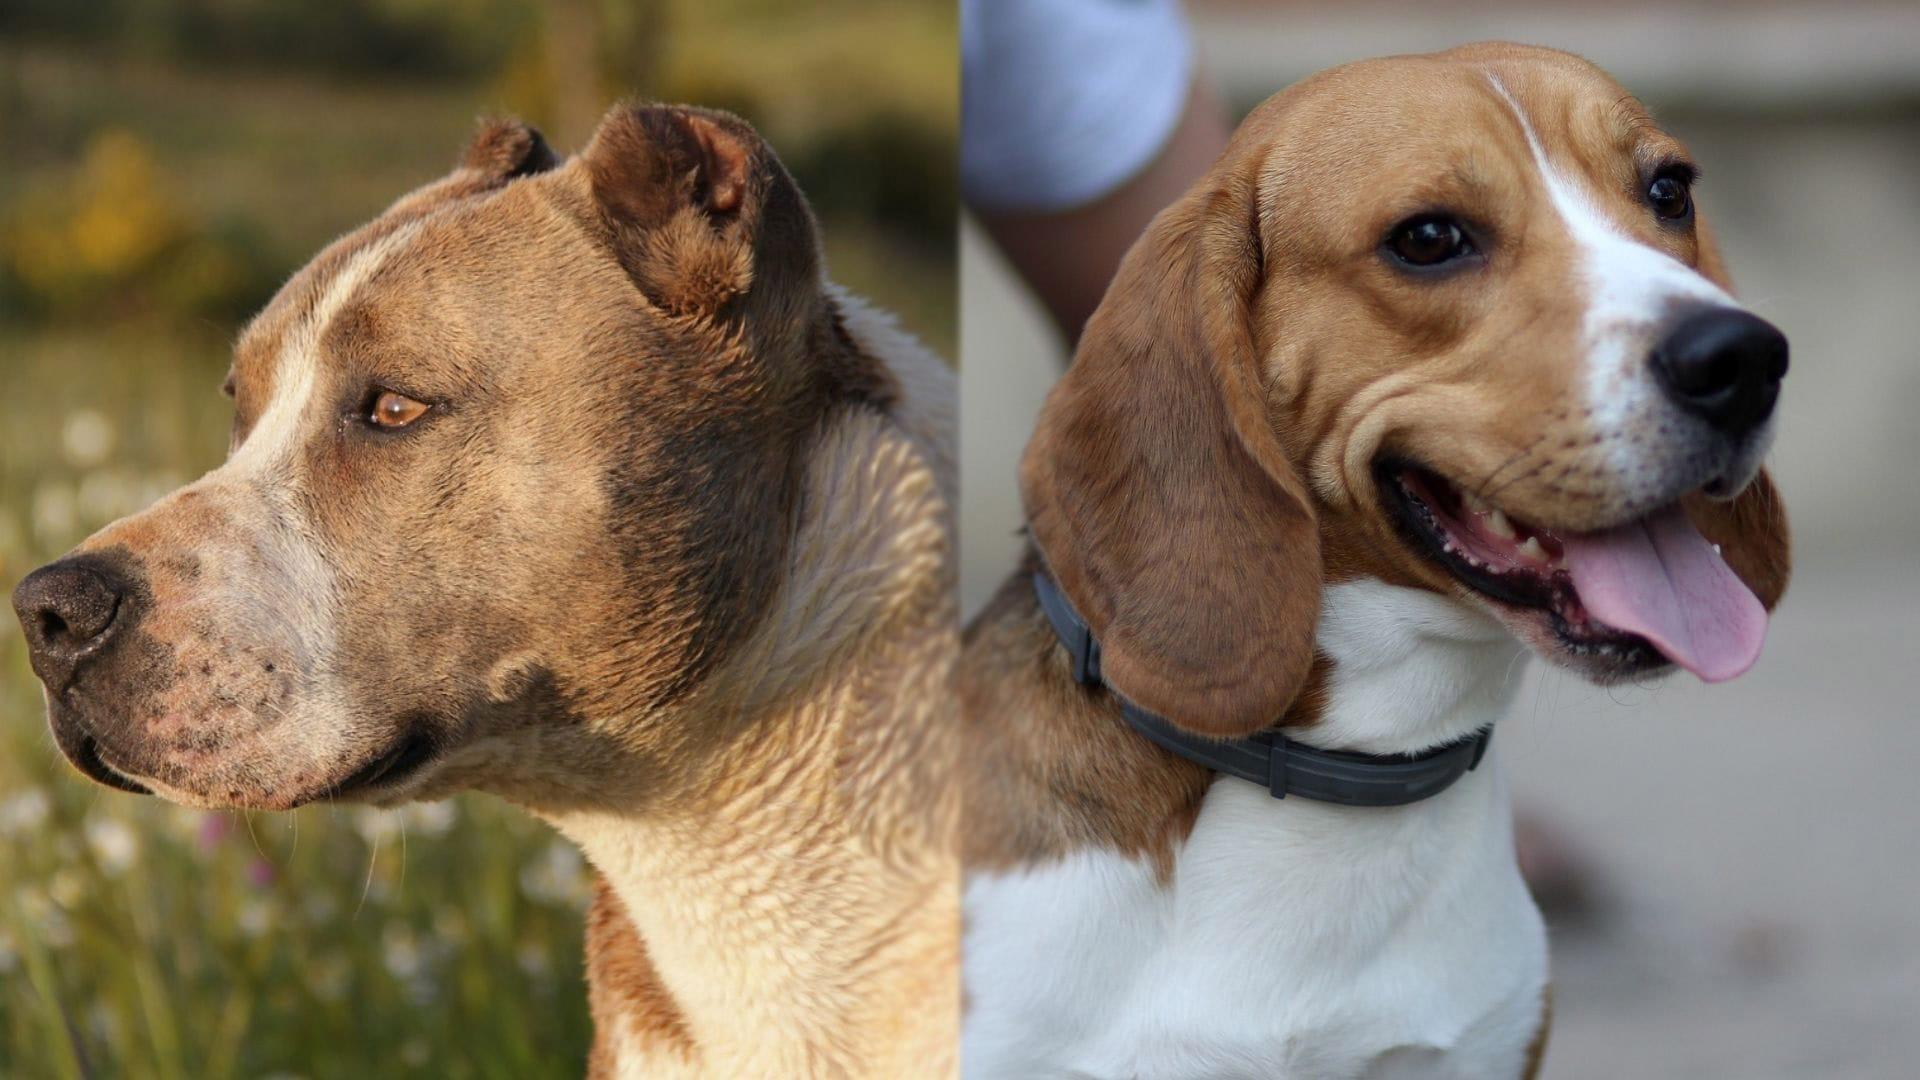 Beaglebull - Beagle and Pitbull Mix